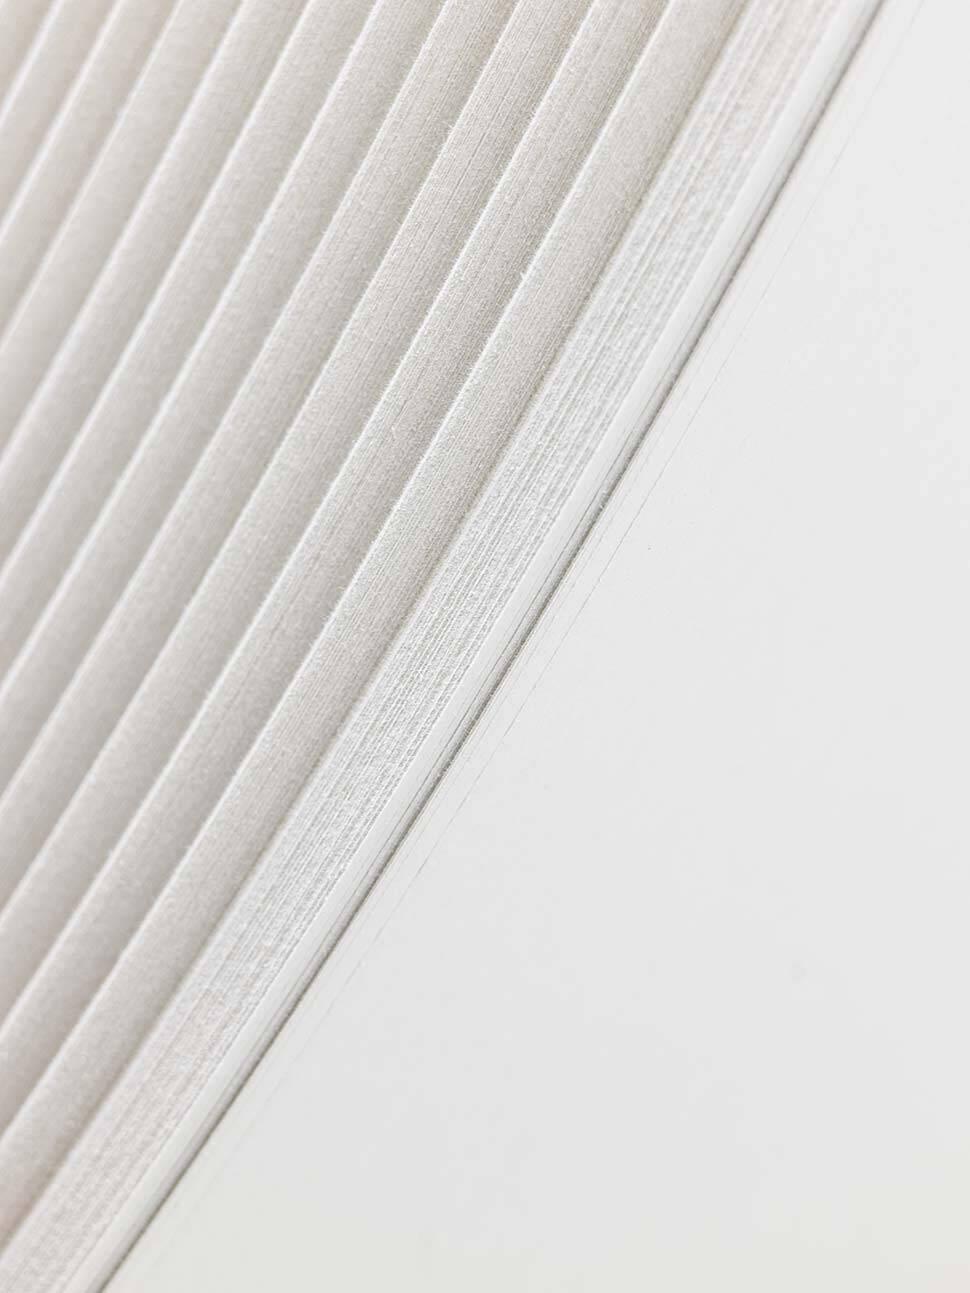 papierherstellung-detail-tambour